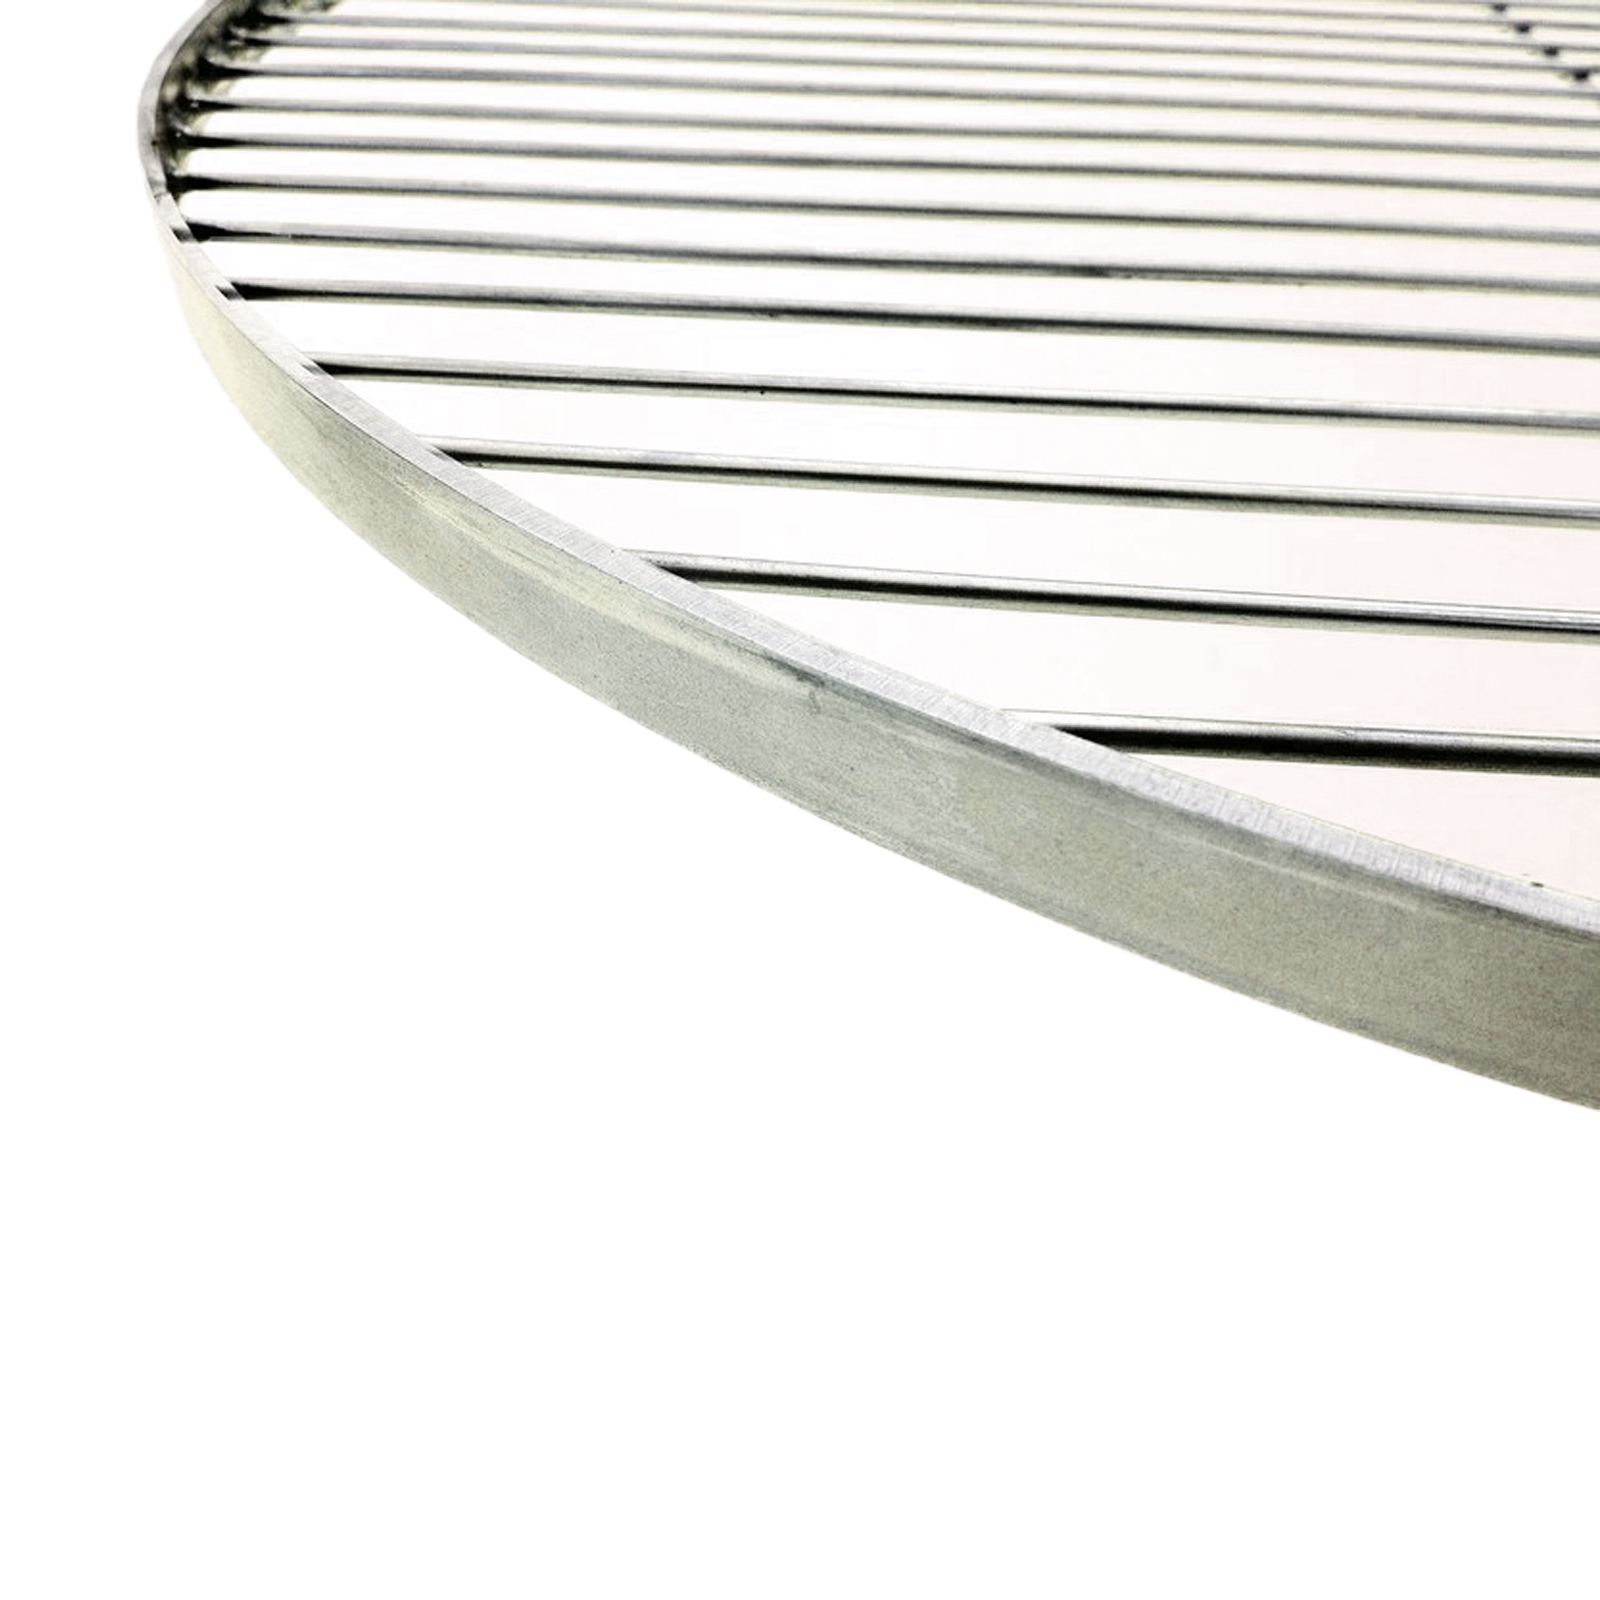 53 cm grillrost rund schwenkgrill rost grill edelstahl mit seil ebay. Black Bedroom Furniture Sets. Home Design Ideas